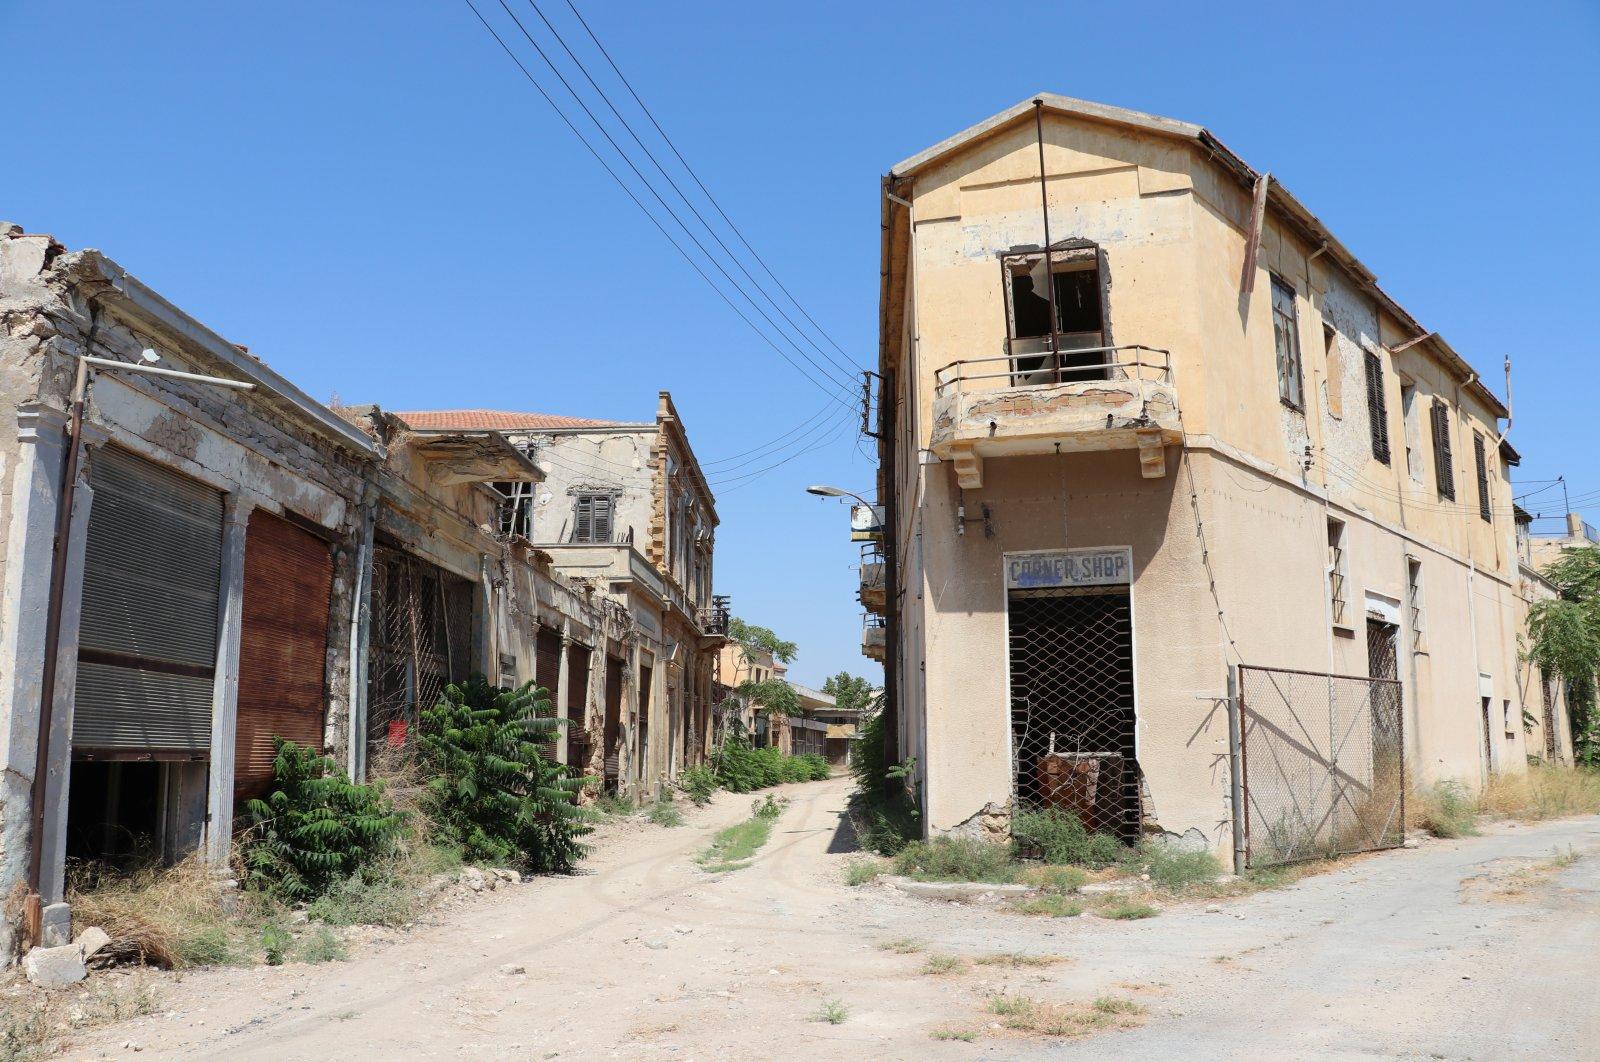 A view from Varosha (Maraş) in the Turkish Republic of Northern Cyprus (TRNC), July 26, 2021. (AA Photo)